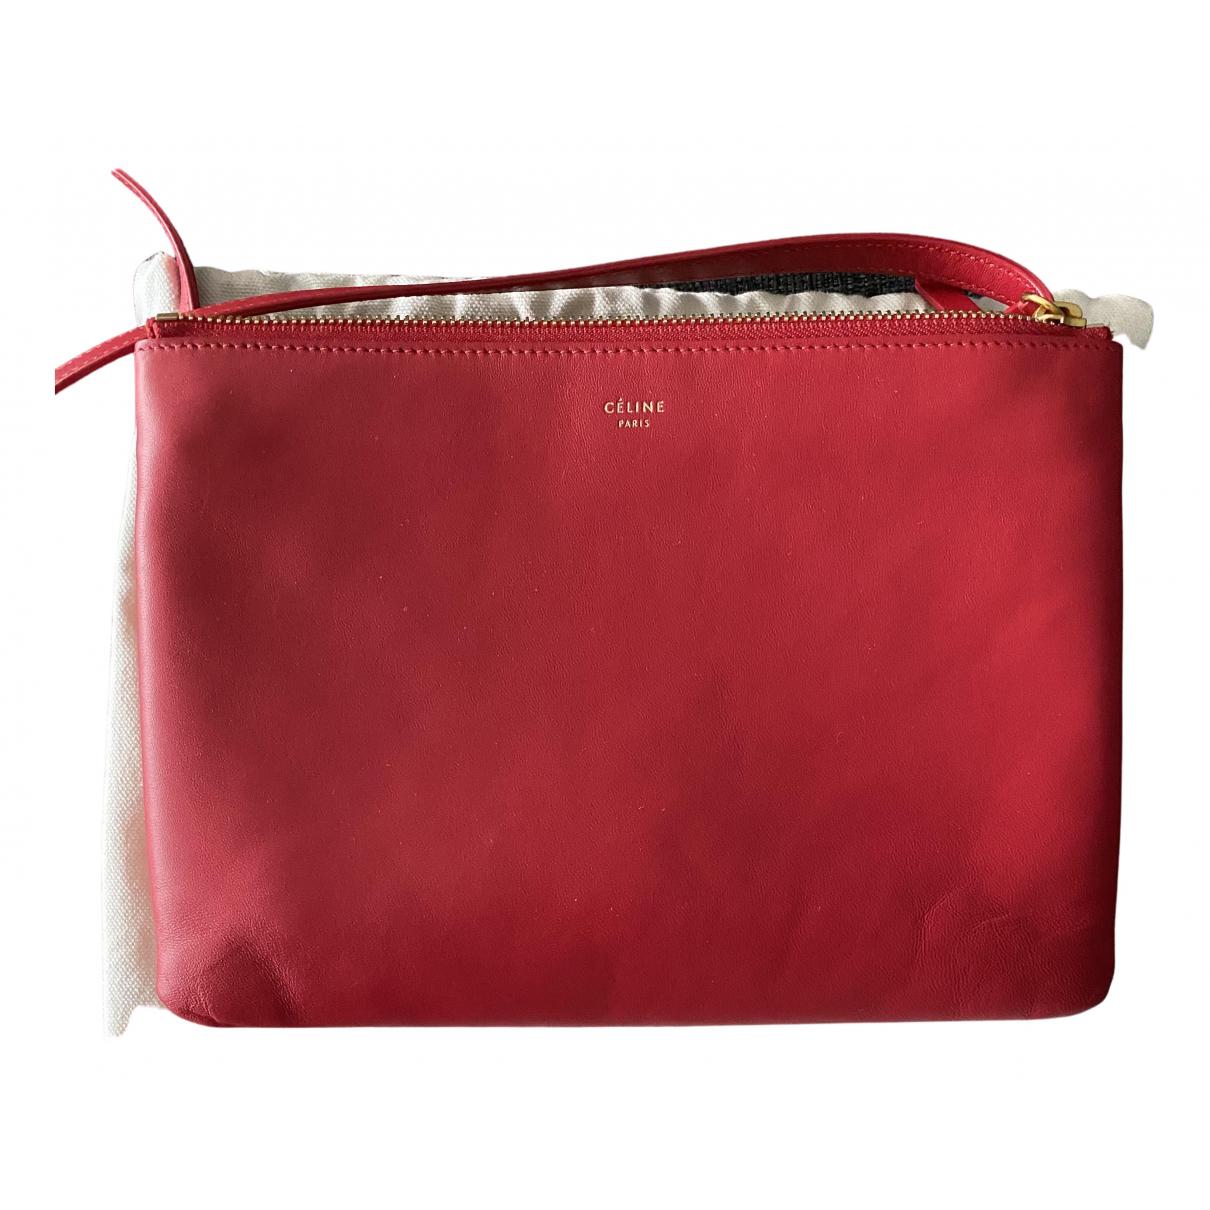 Celine Trio Handtasche in  Rot Leder